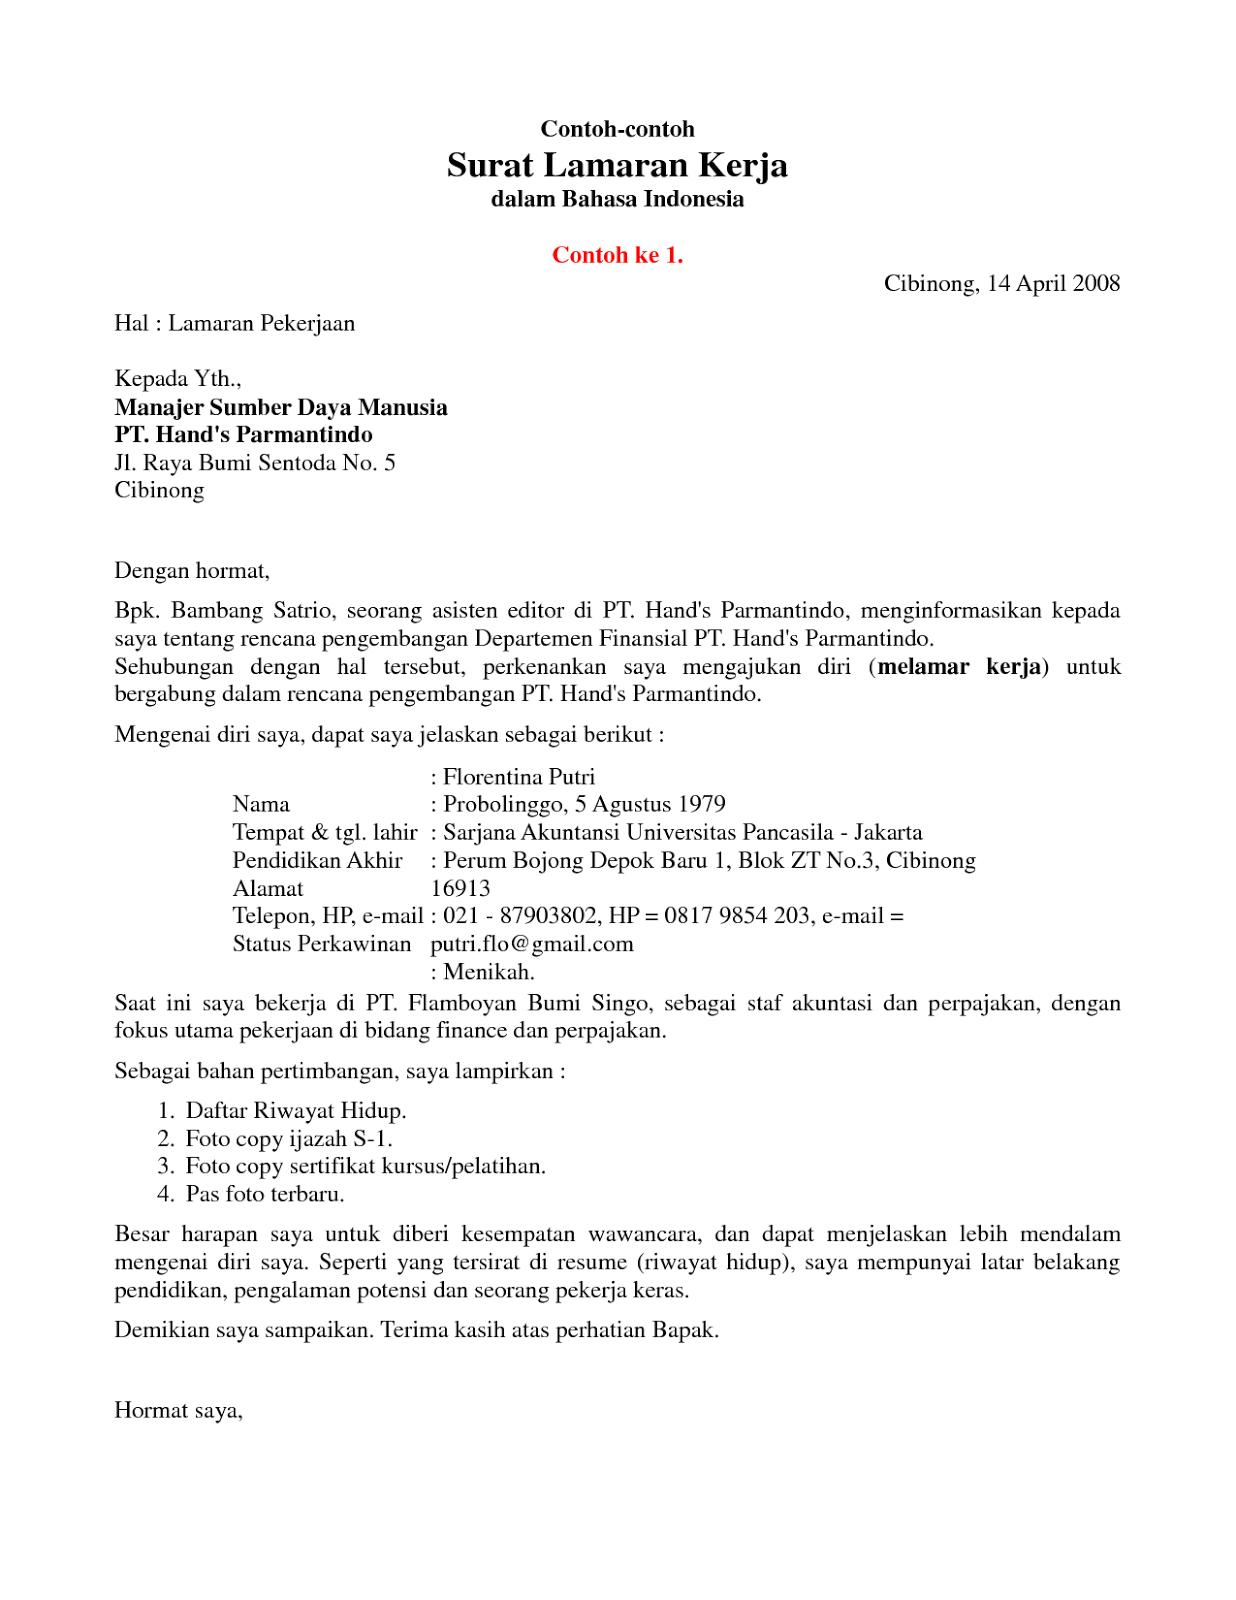 Surat Lamaran Kerja Profesional Surat Cv Kreatif Pendidikan Dasar